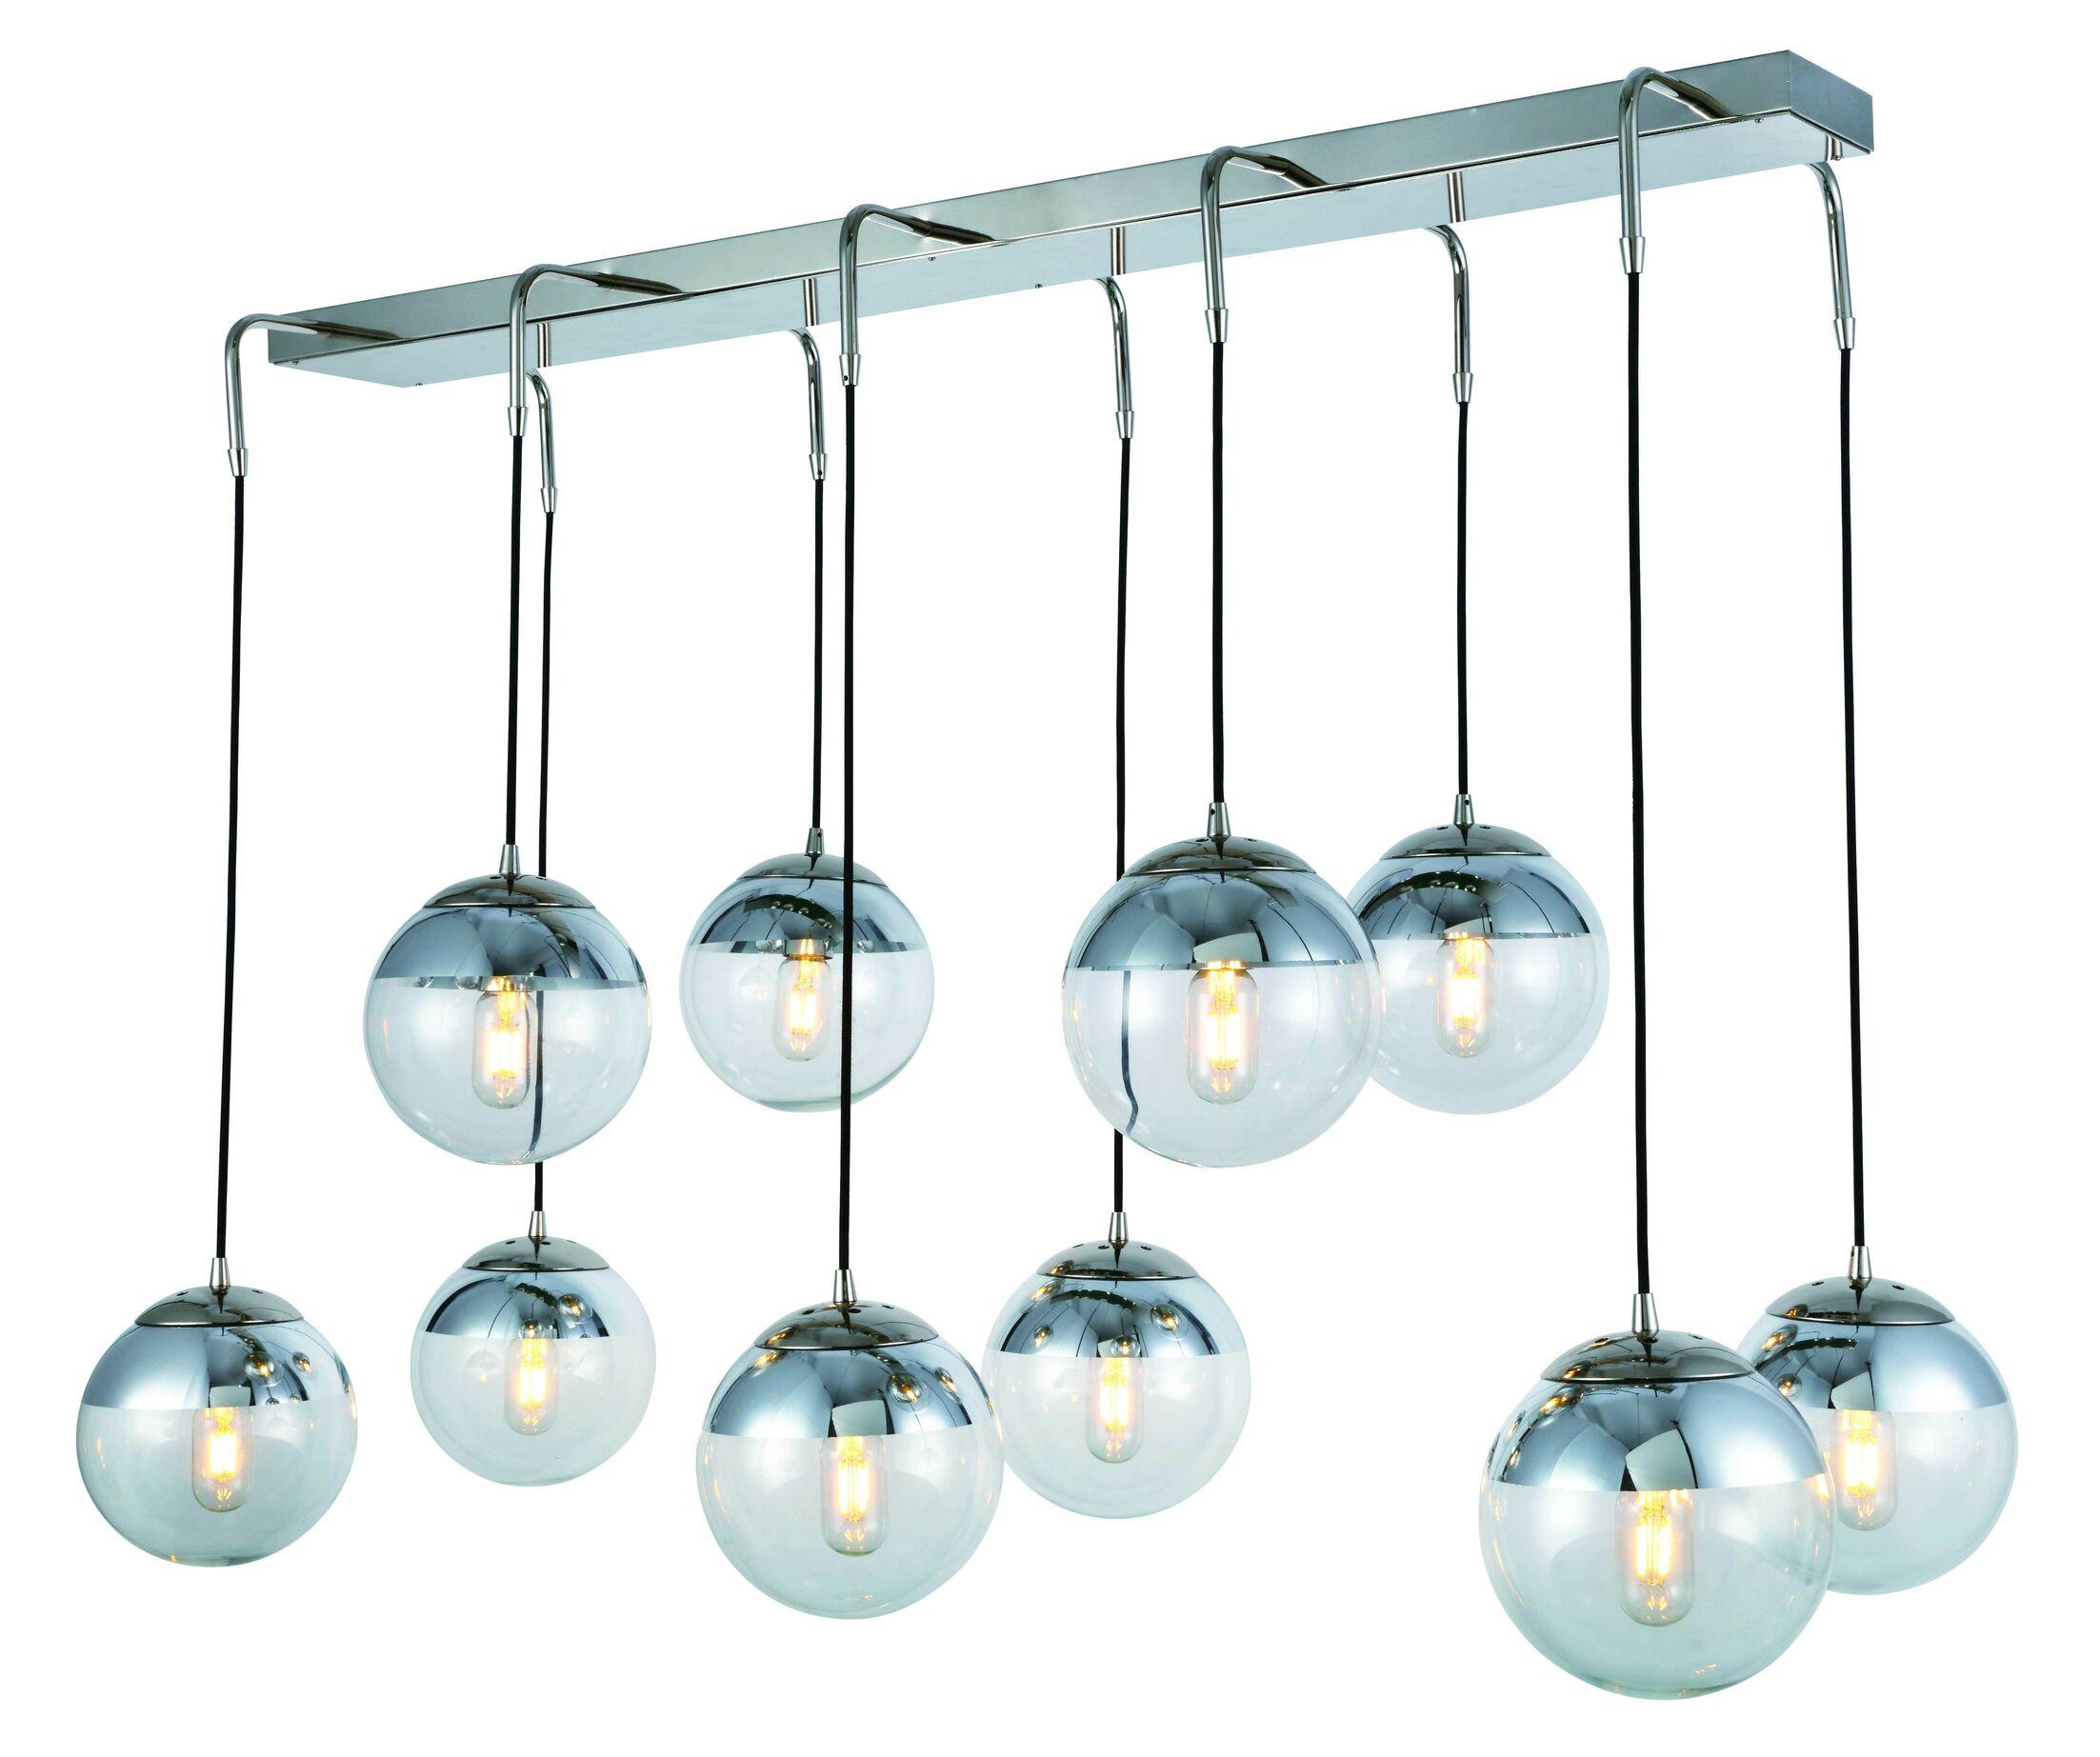 Simeone 10-Light Cluster Pendant